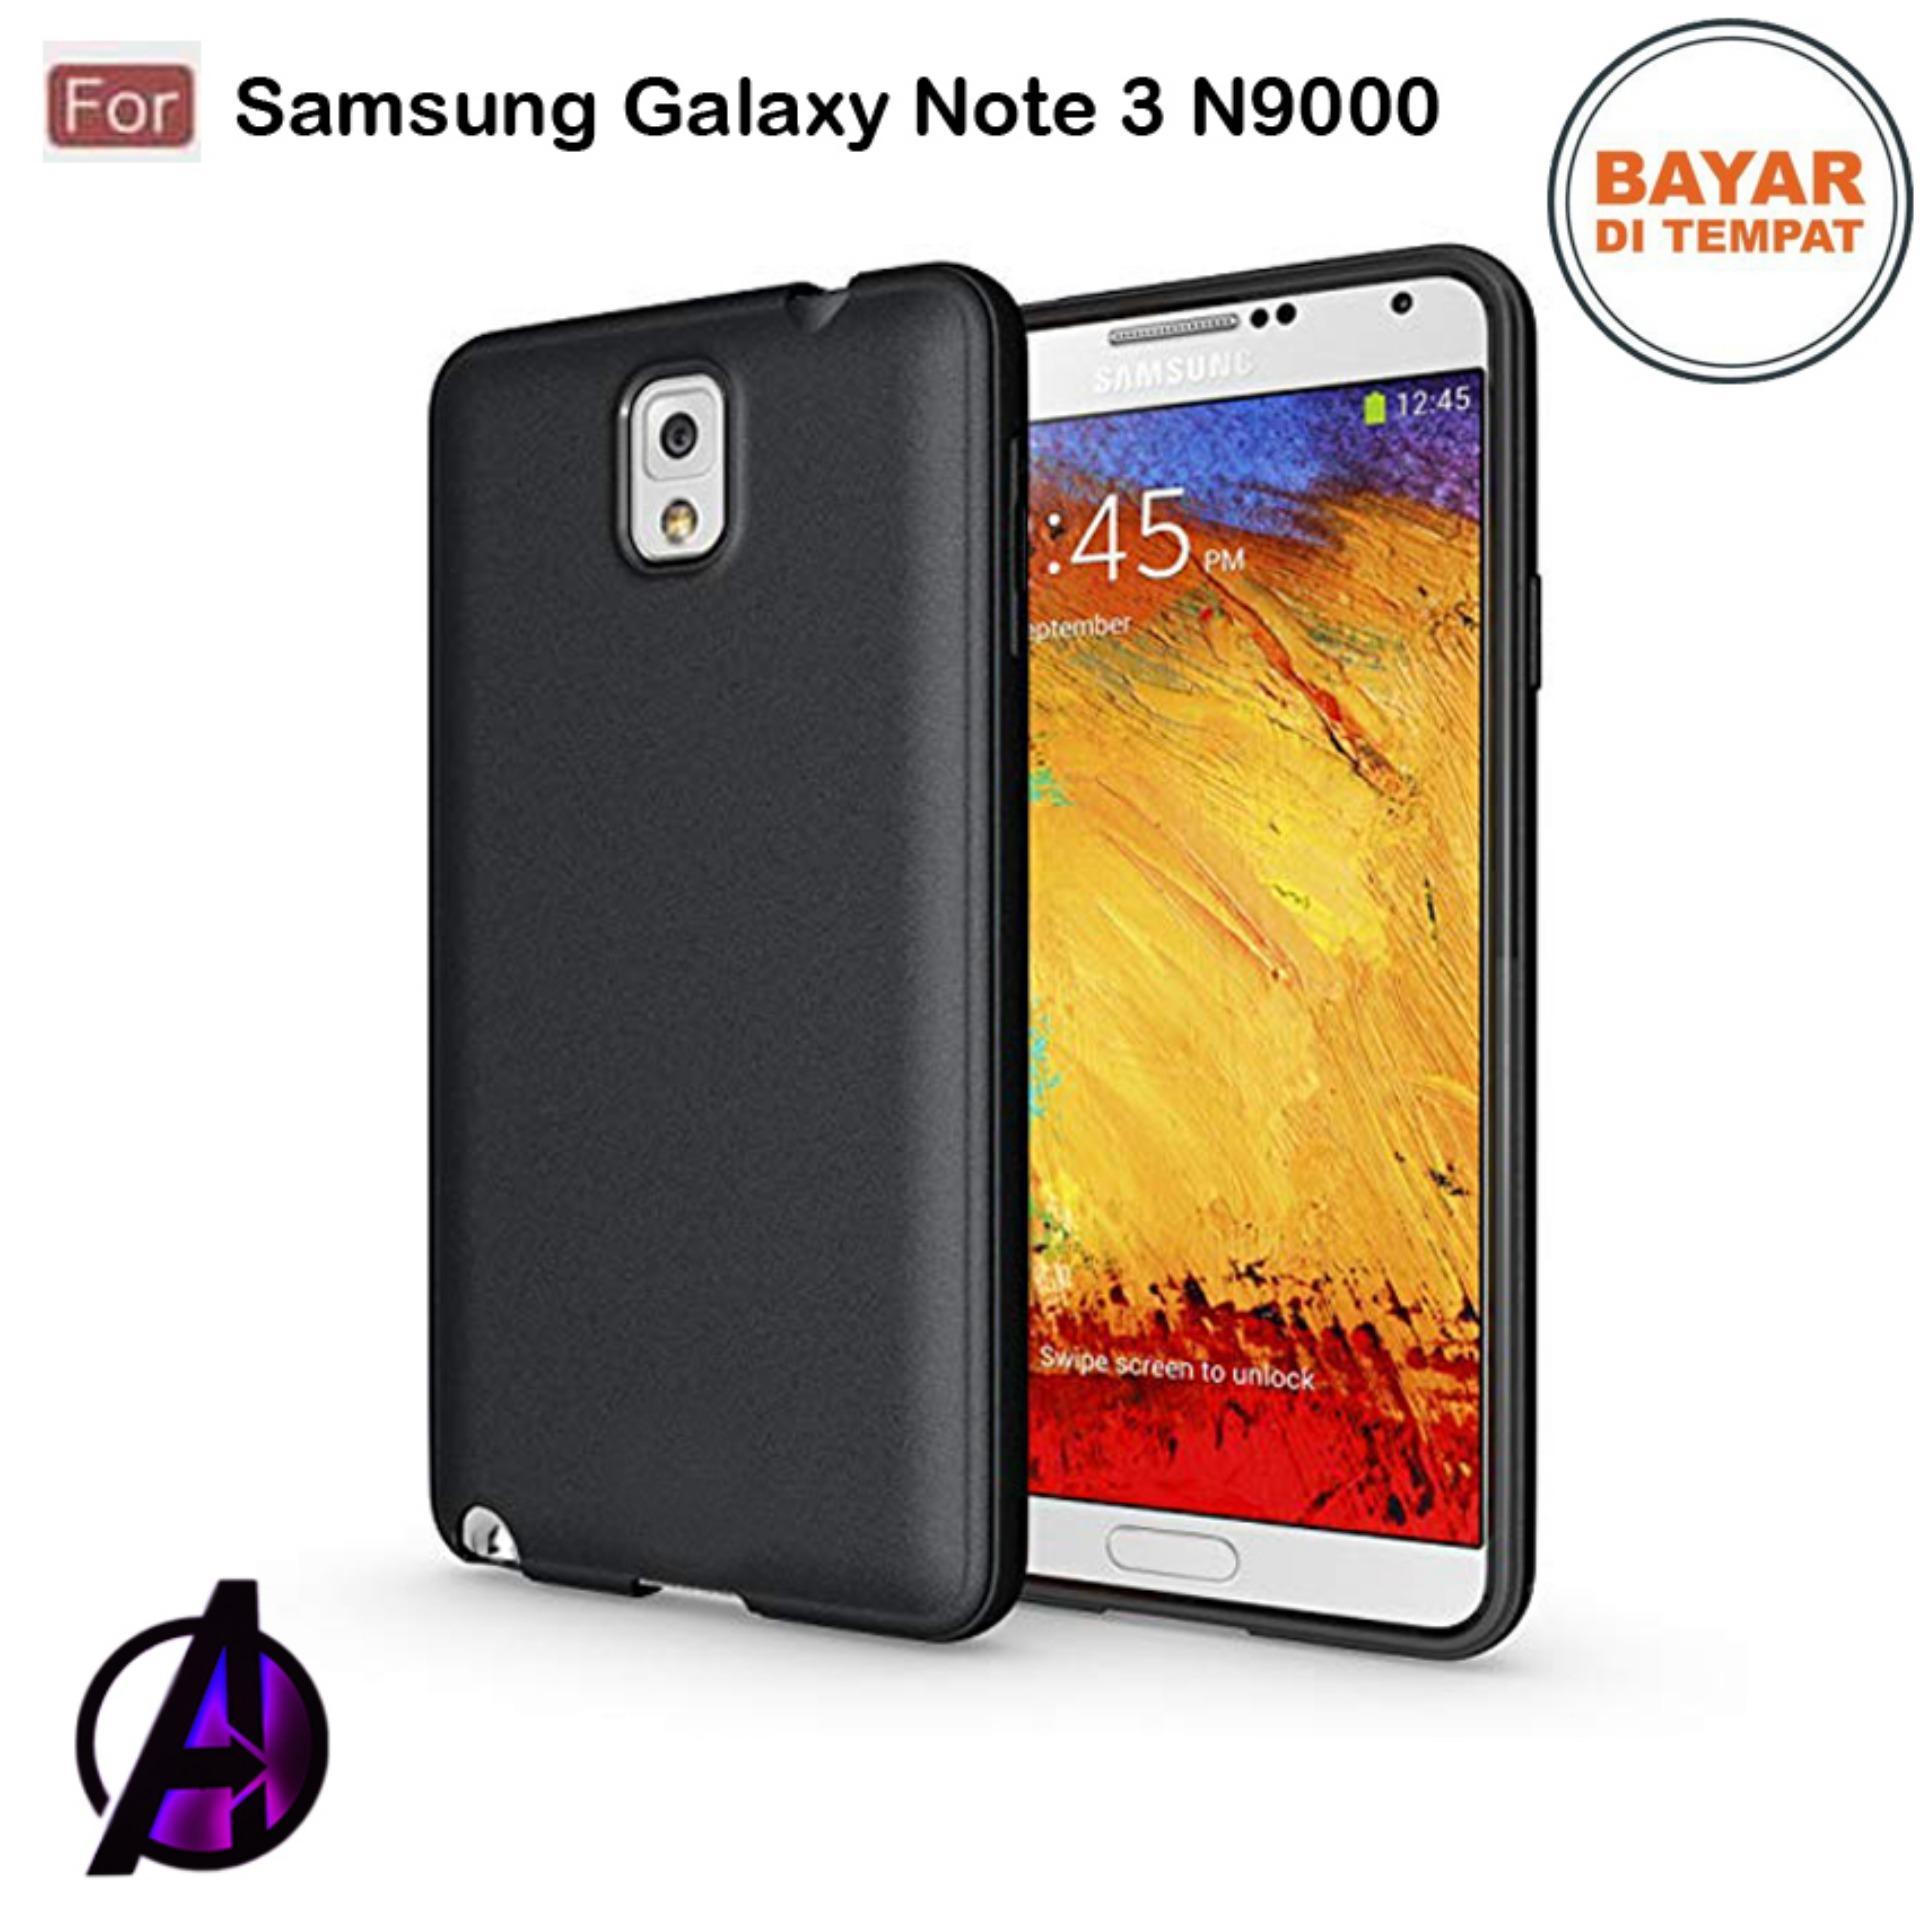 Case Matte Black Soft Slim Casing Handphone Samsung Galaxy Note 3 / N9000